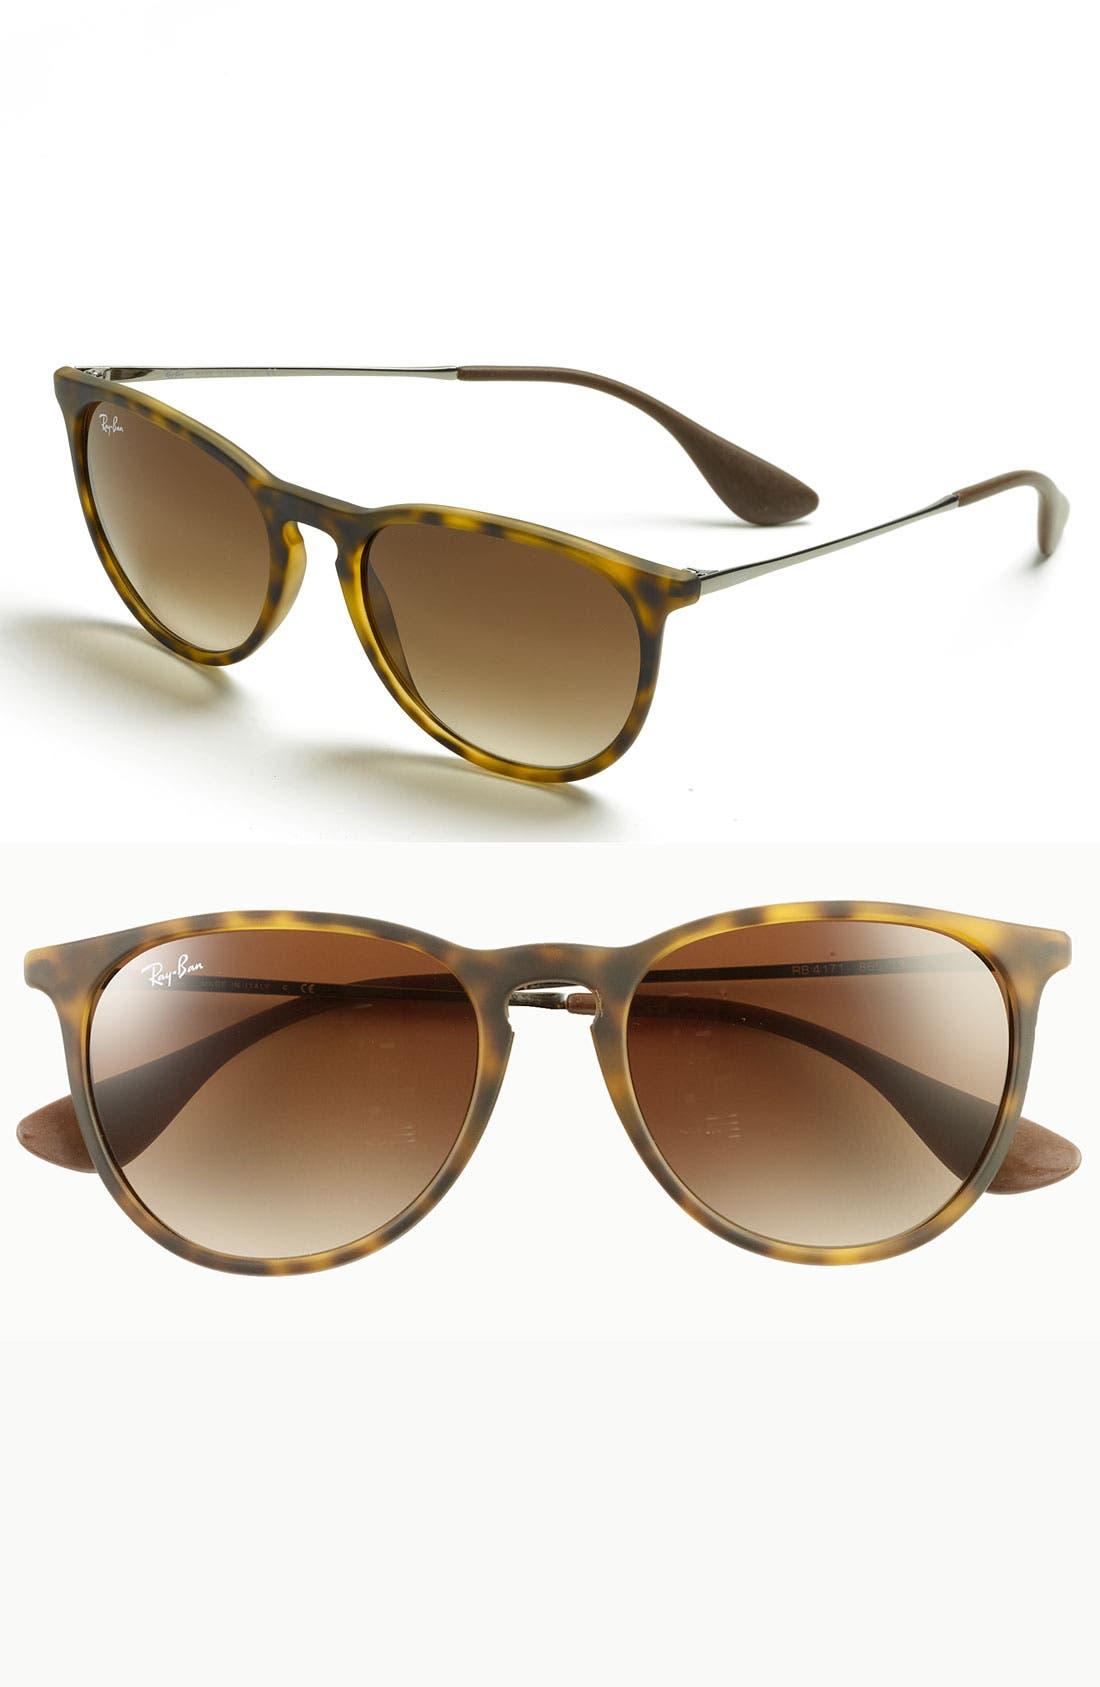 Ray-Ban Erika Classic 5m Sunglasses - Havana/ Brown Gradient